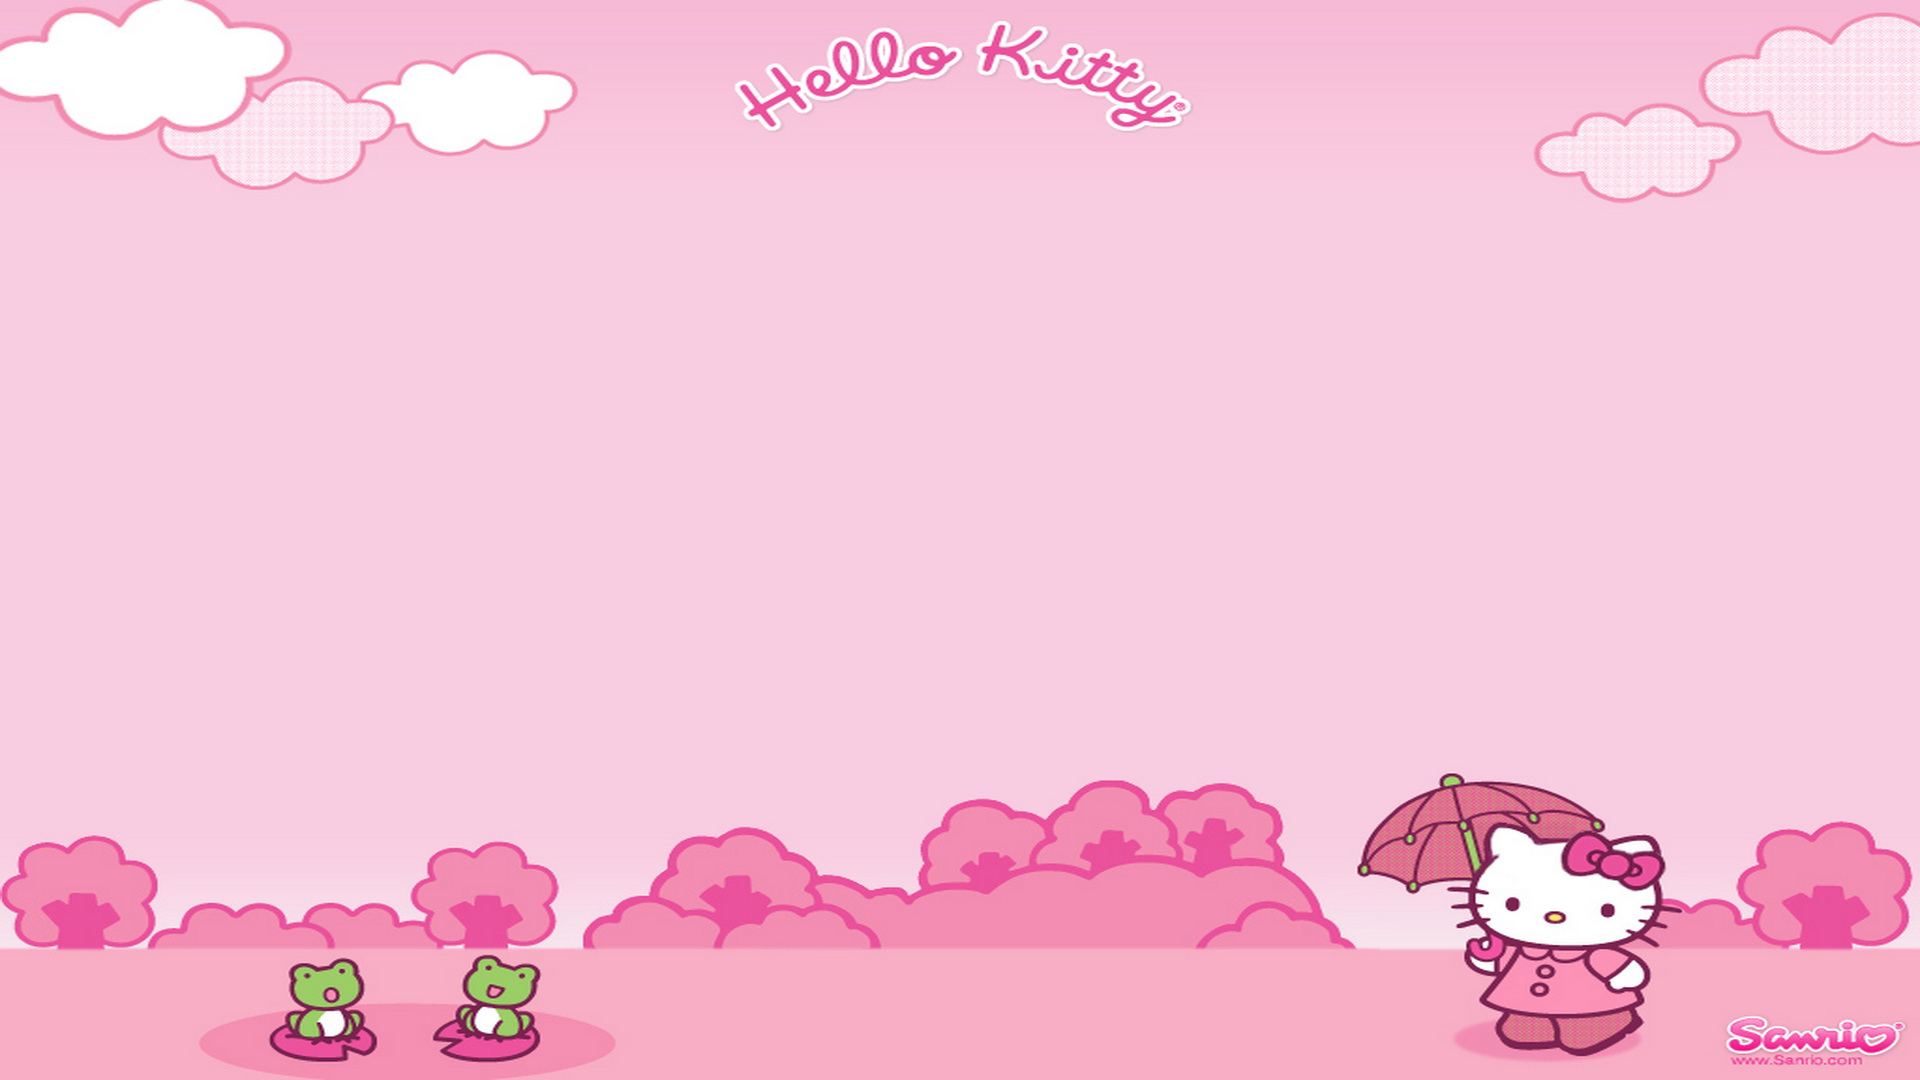 Hello kitty hd wallpaper background image 1920x1080 - Wallpaper hello kitty full hd ...